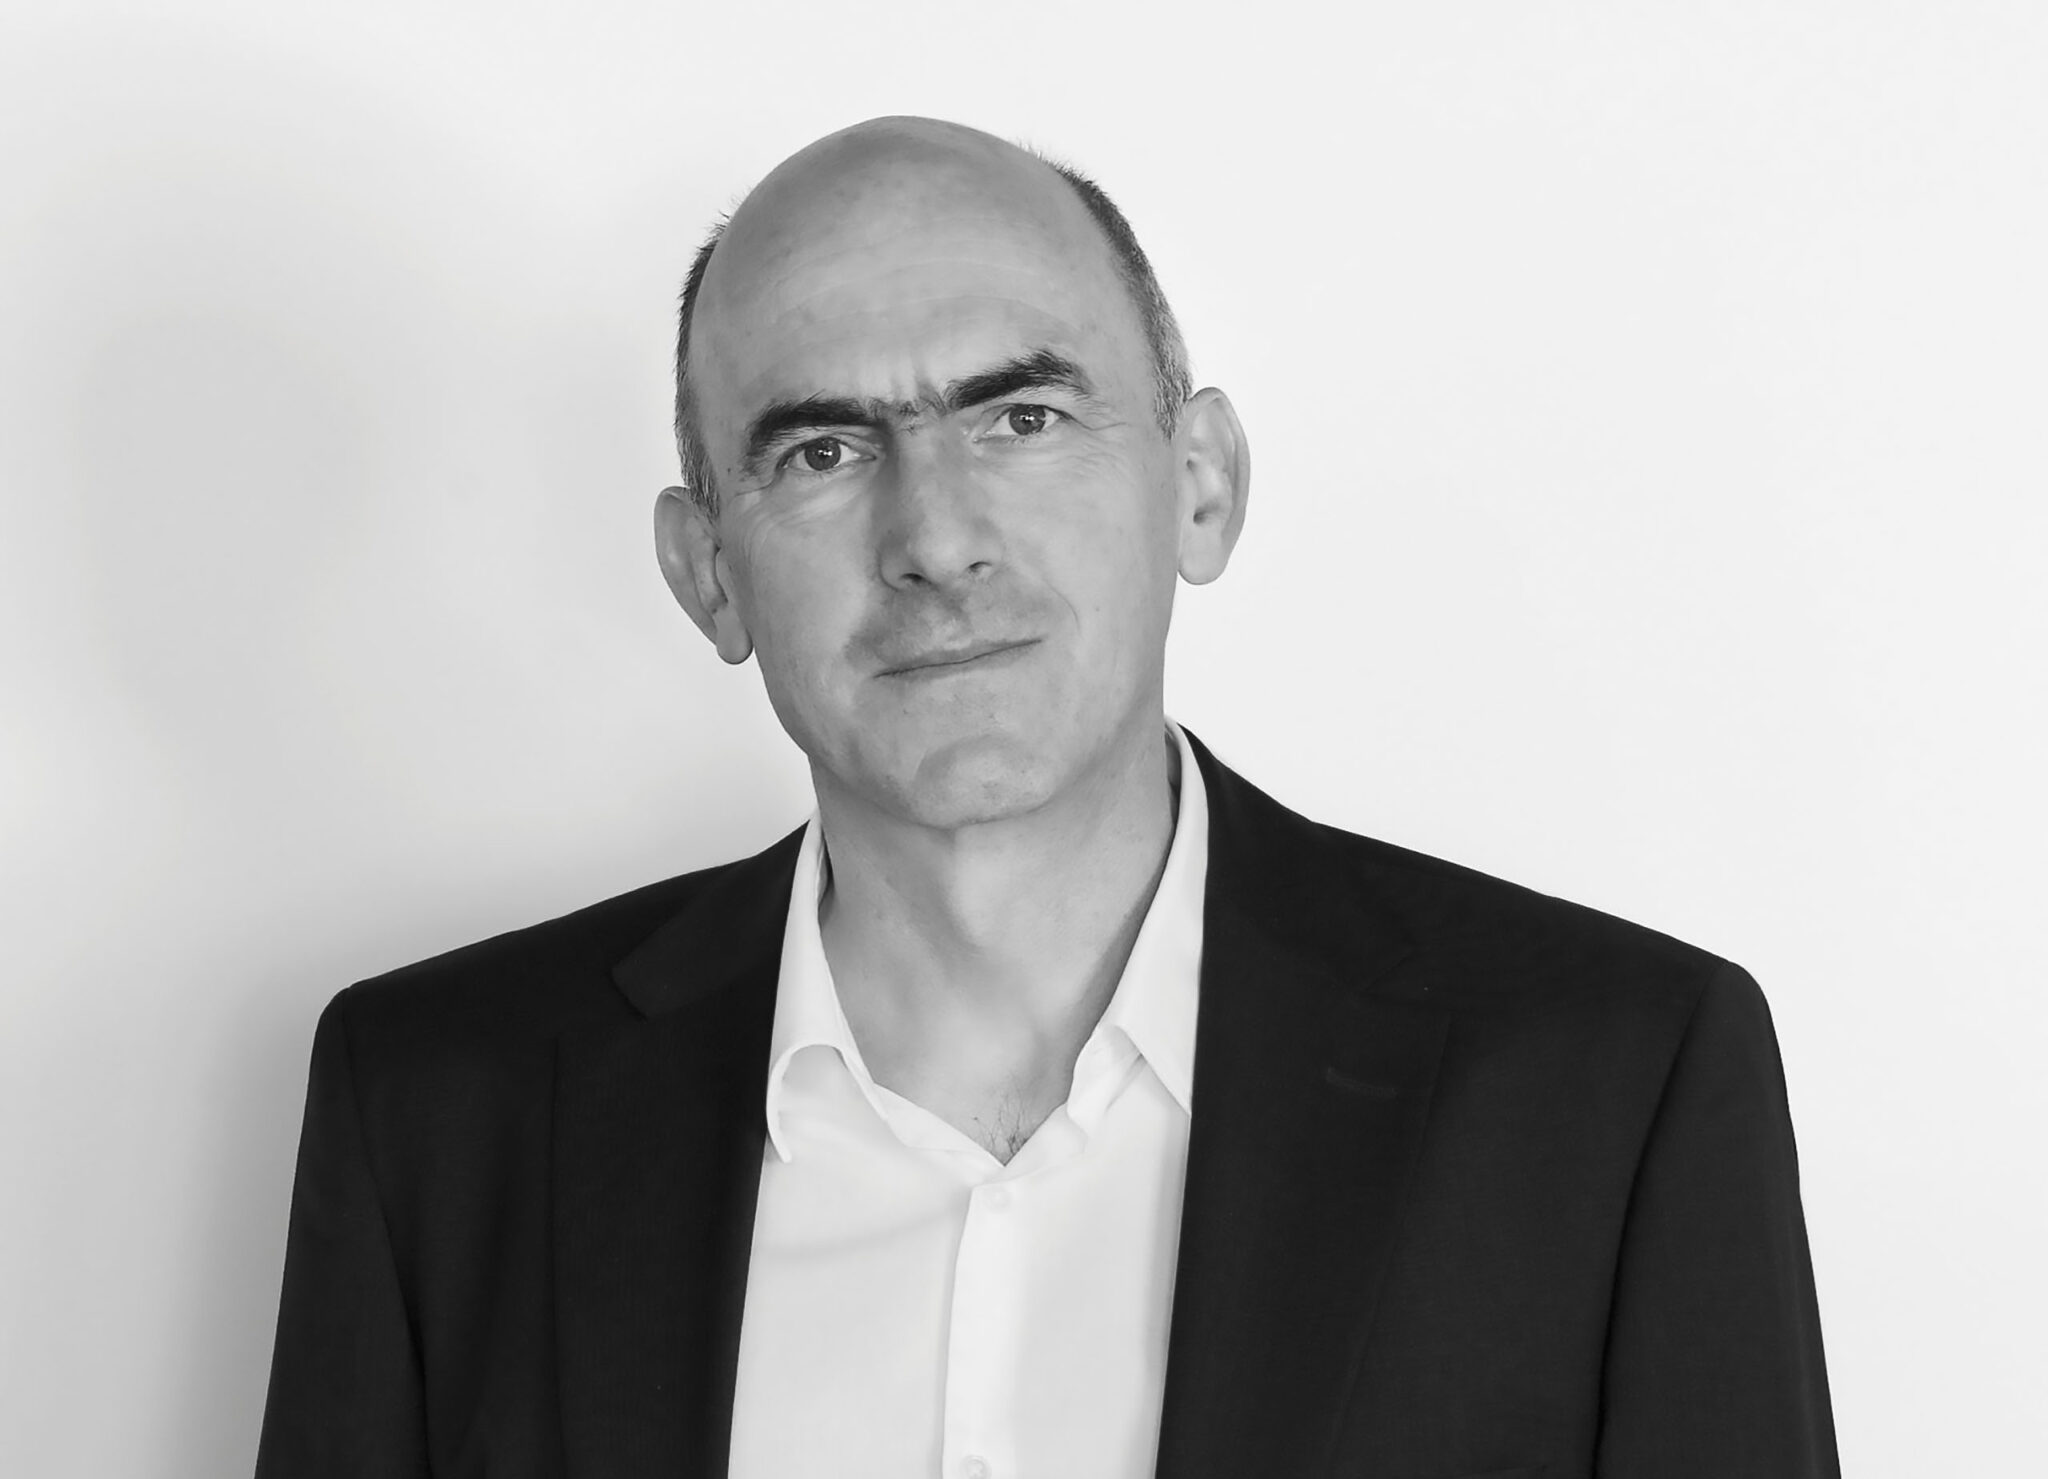 Portrait Mike Schlaich